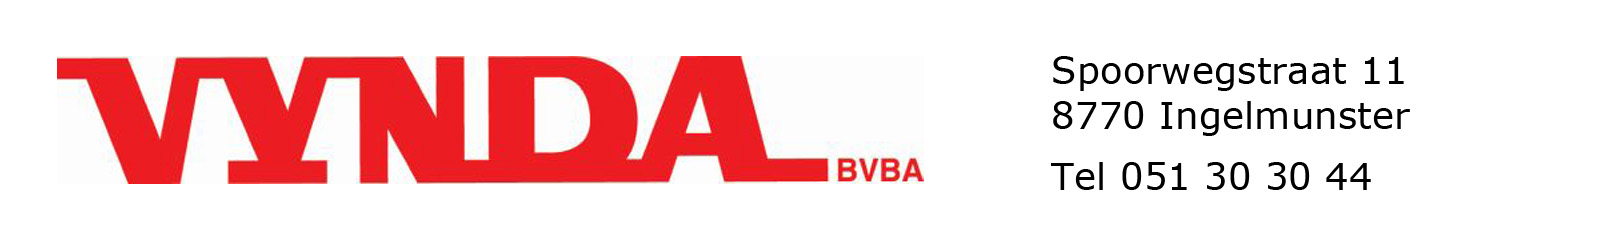 Vynda Ingelmunster Logo